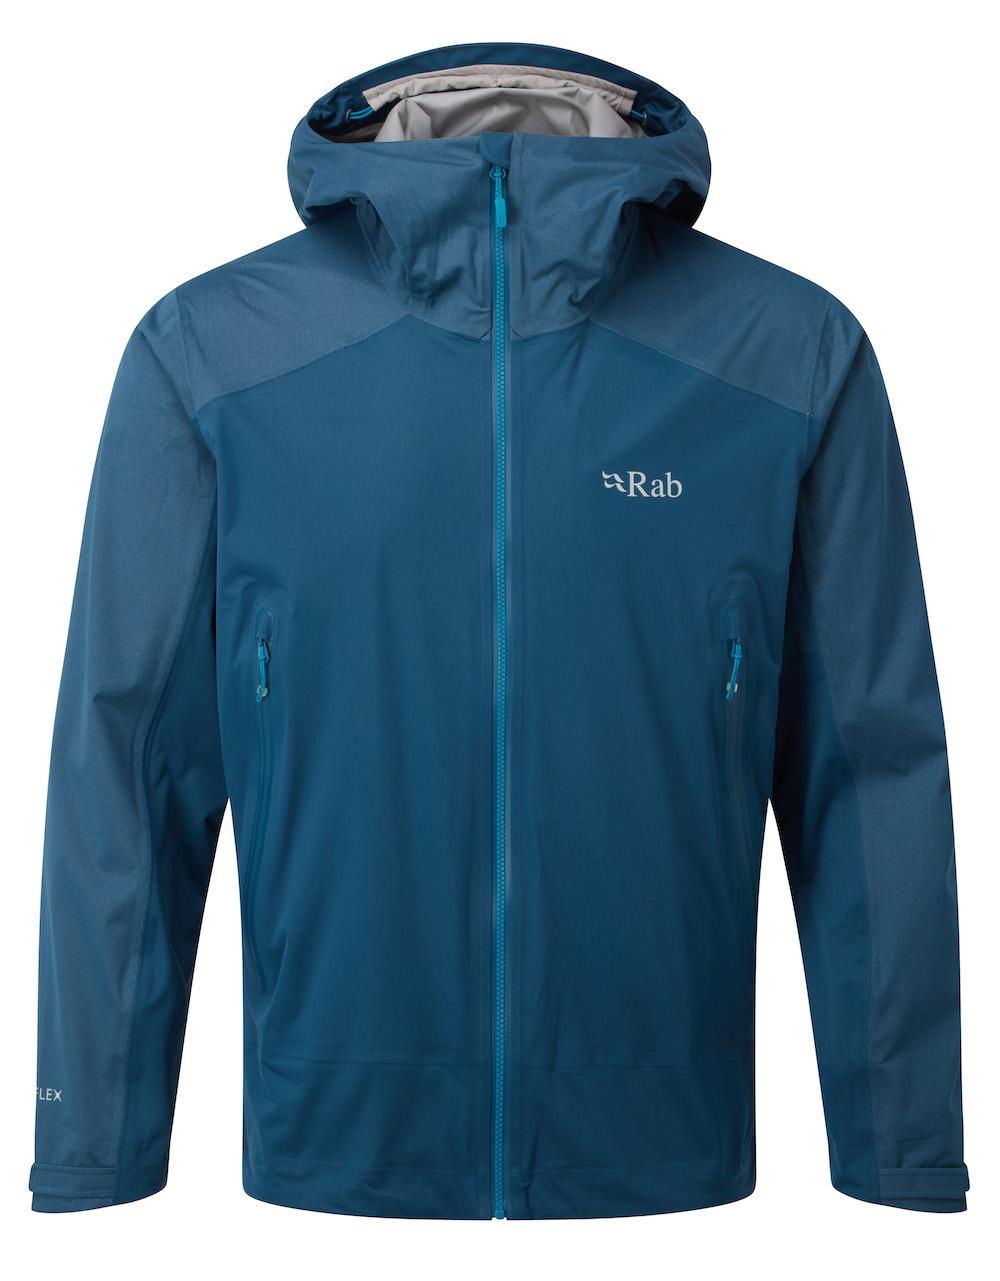 Rab Kinetic Alpine Jacket - Hardshell jacket - Men's